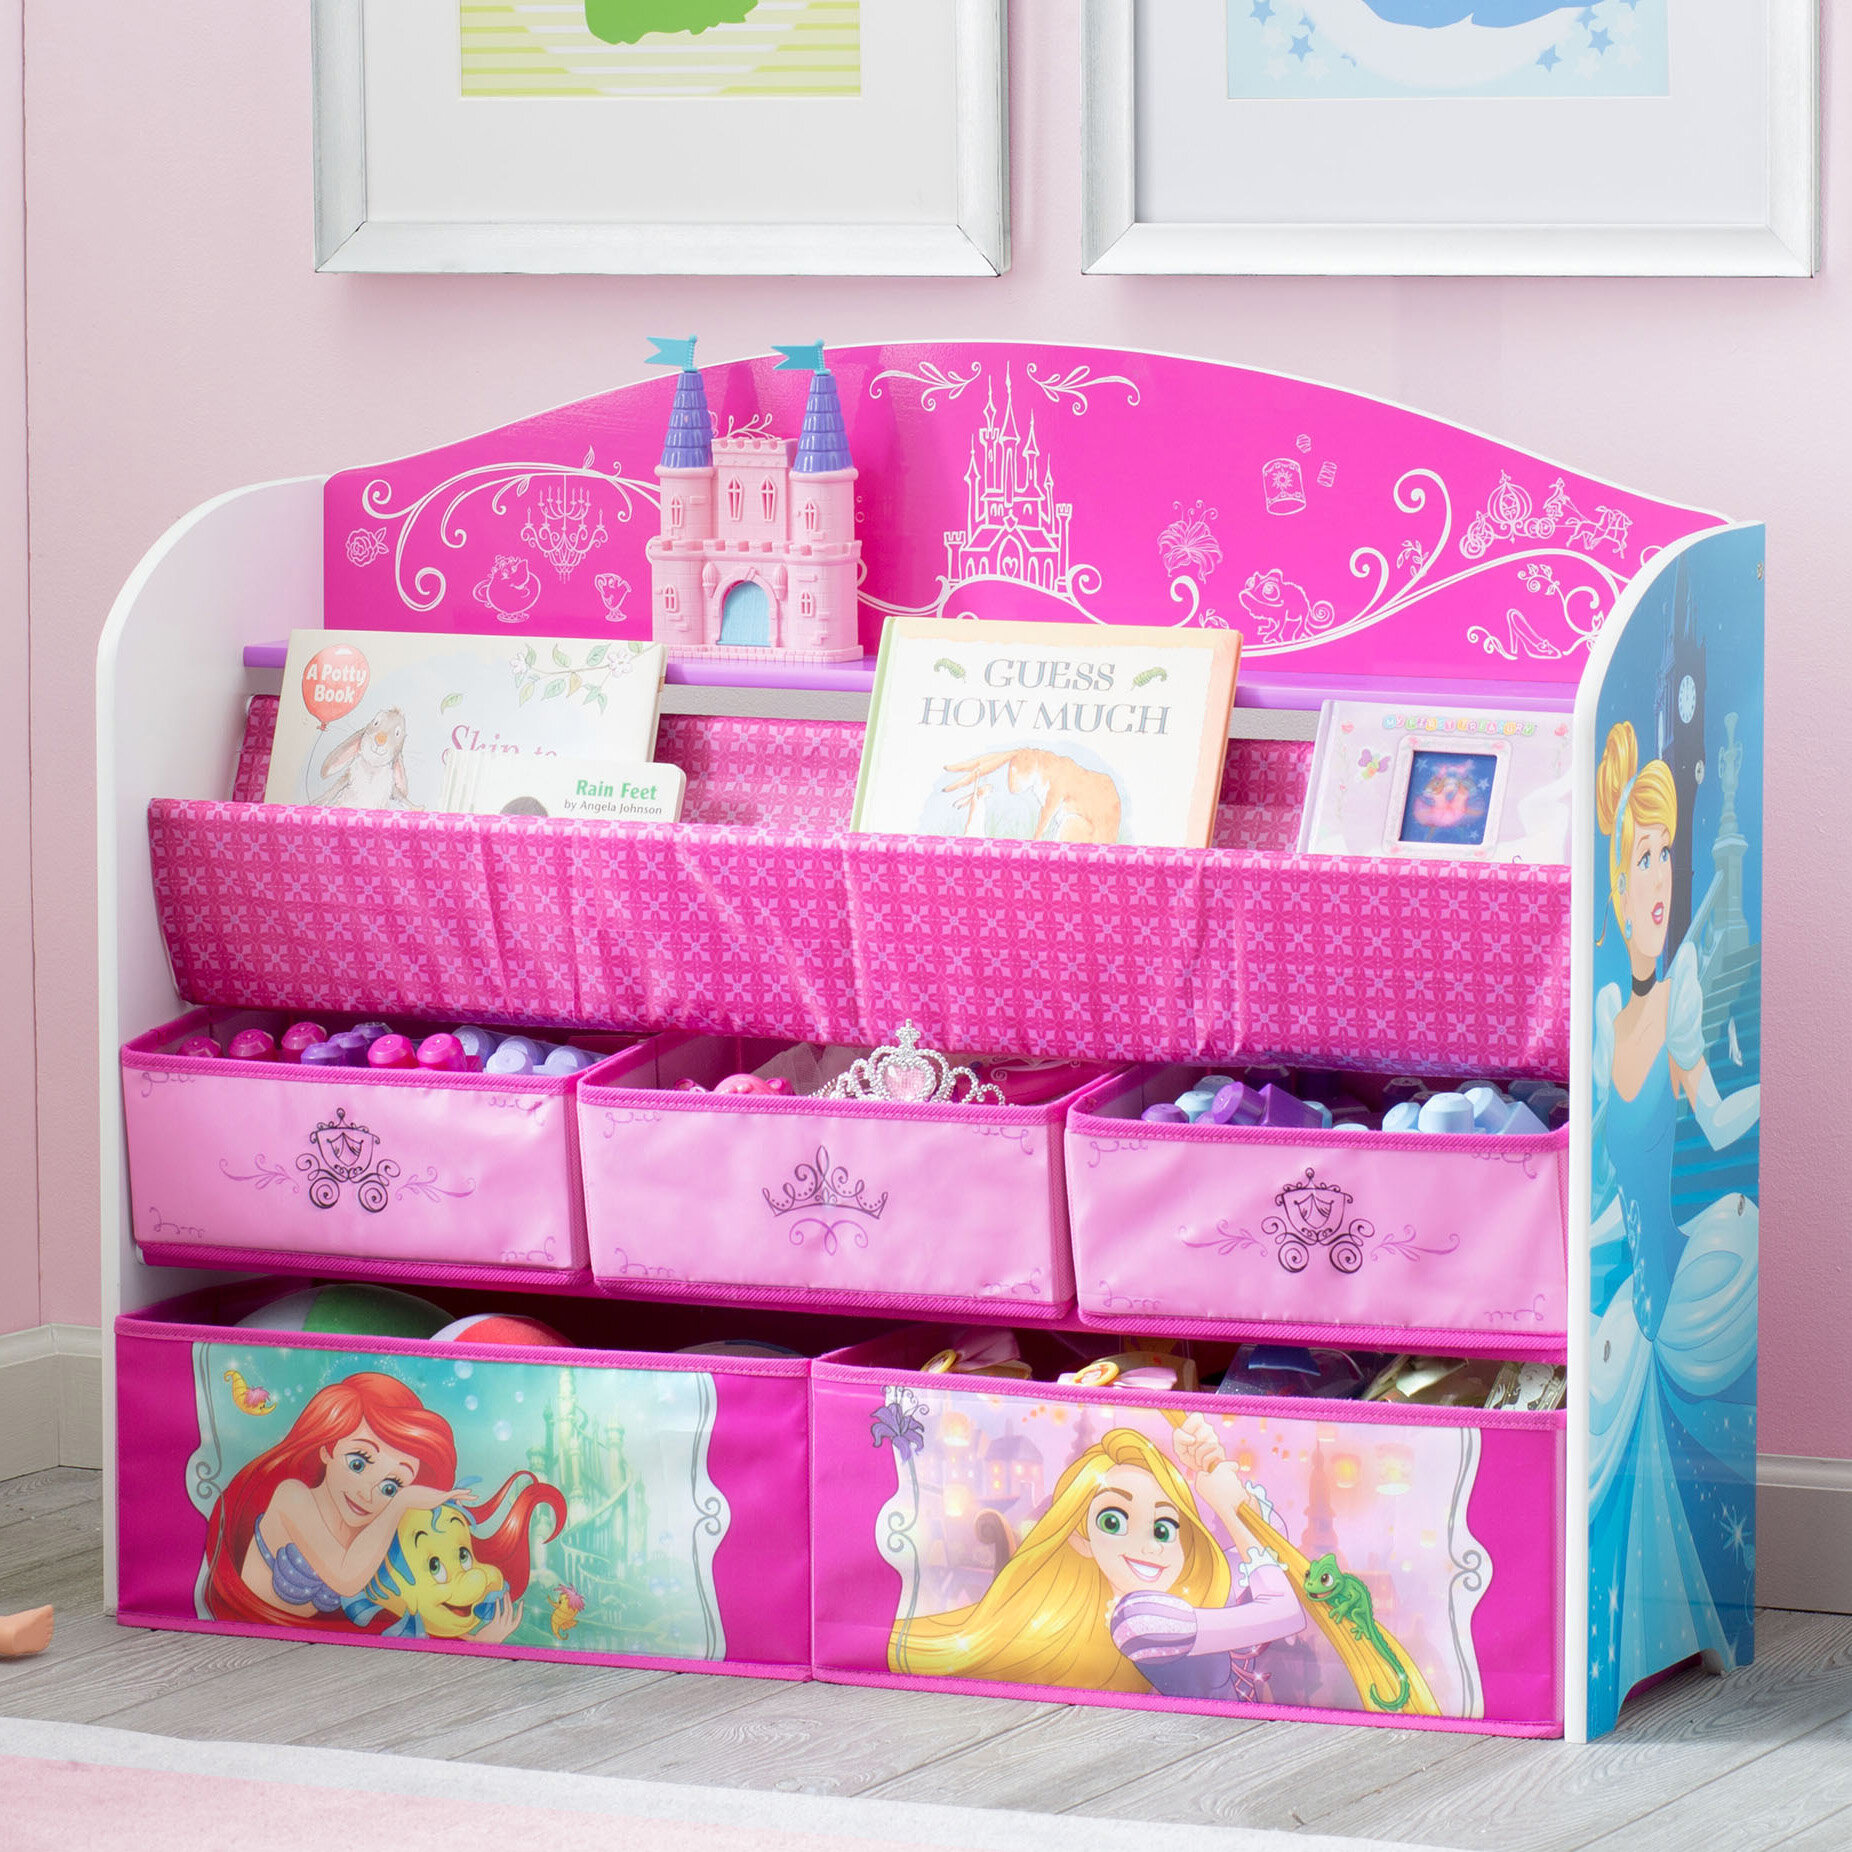 Delta Children Disney Princess Deluxe Book Toy Organizer Reviews